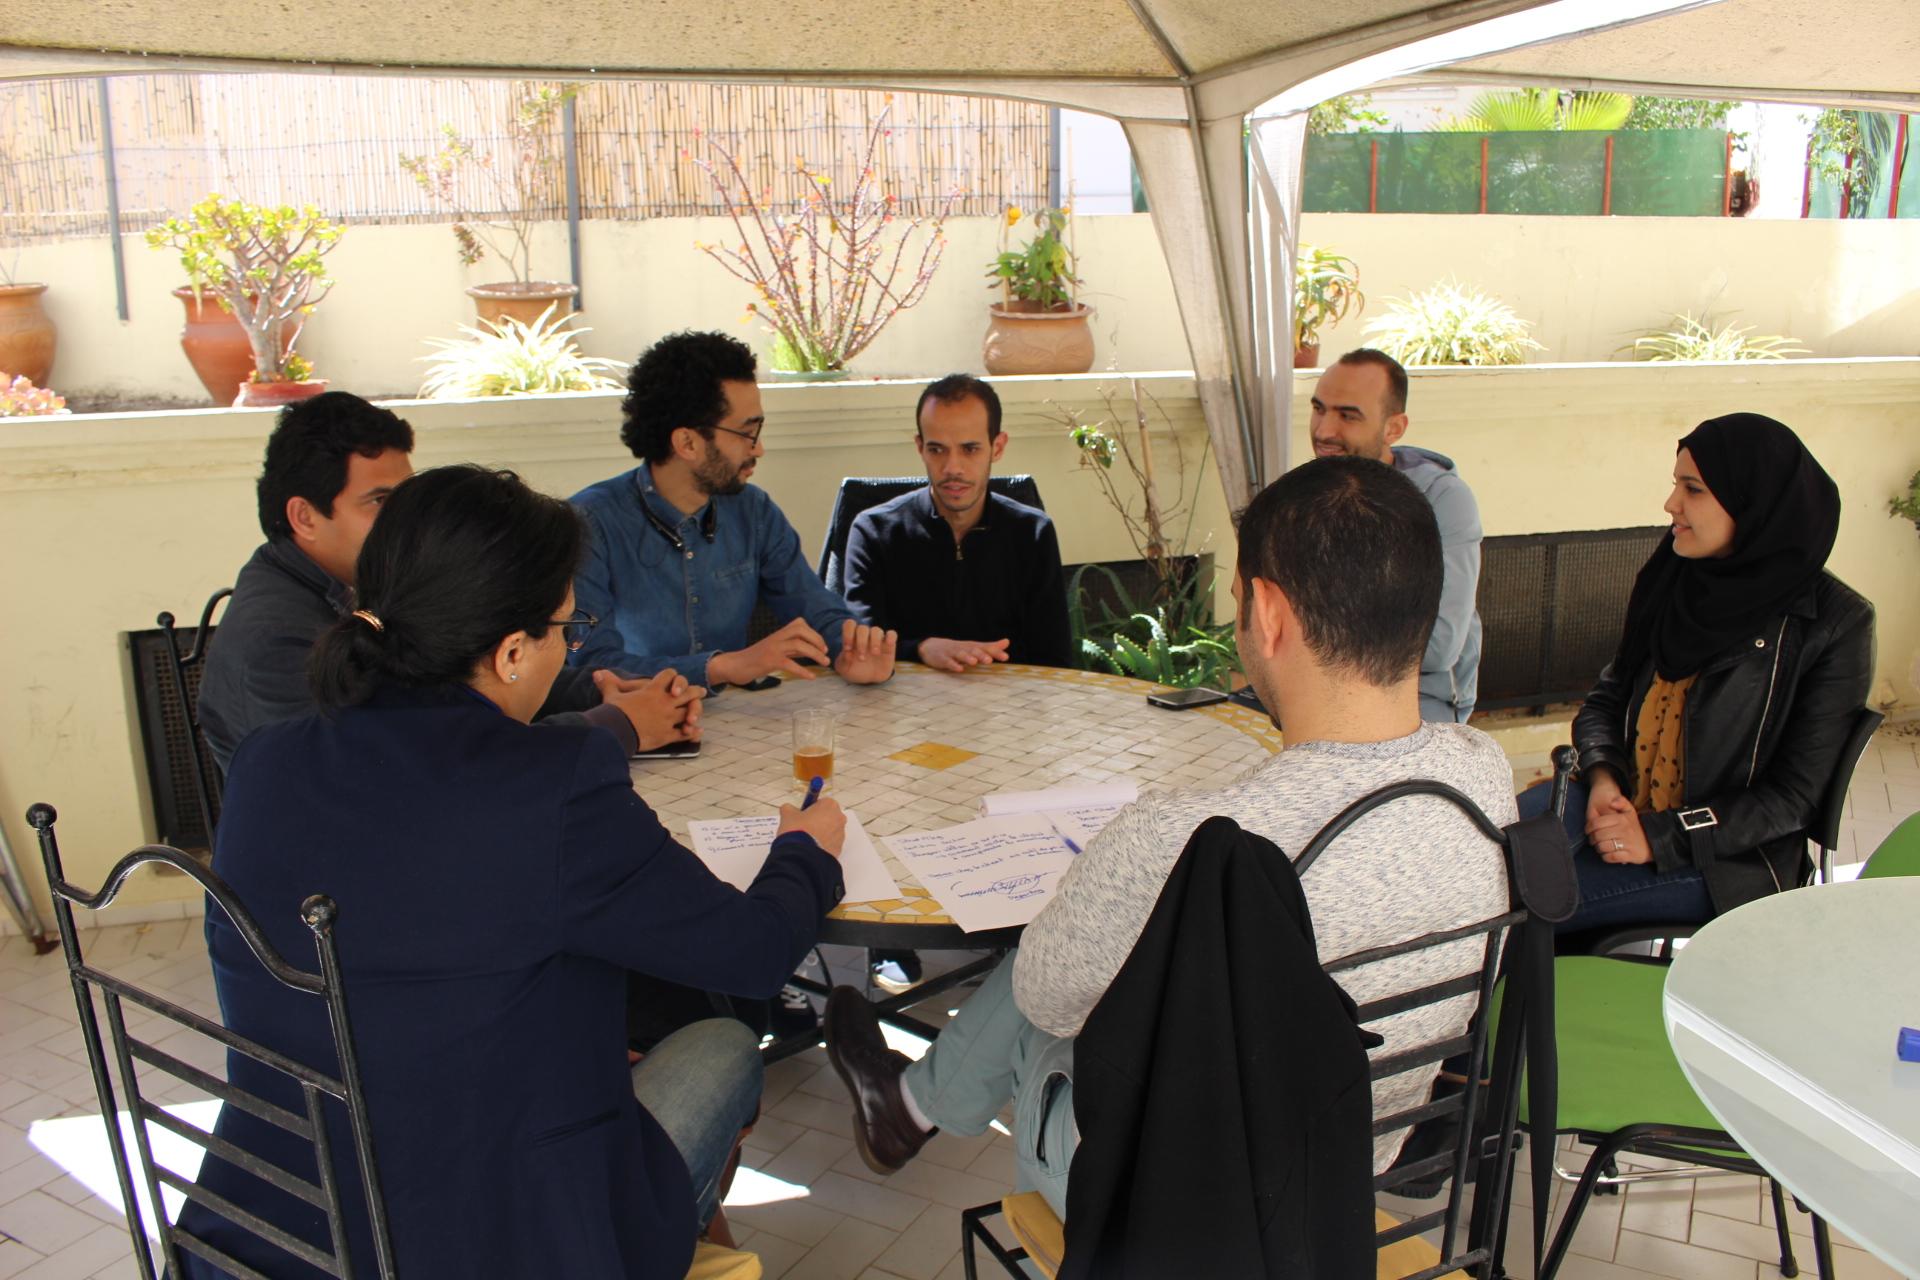 Rencontres maroc casablanca Rencontres activits portuaires